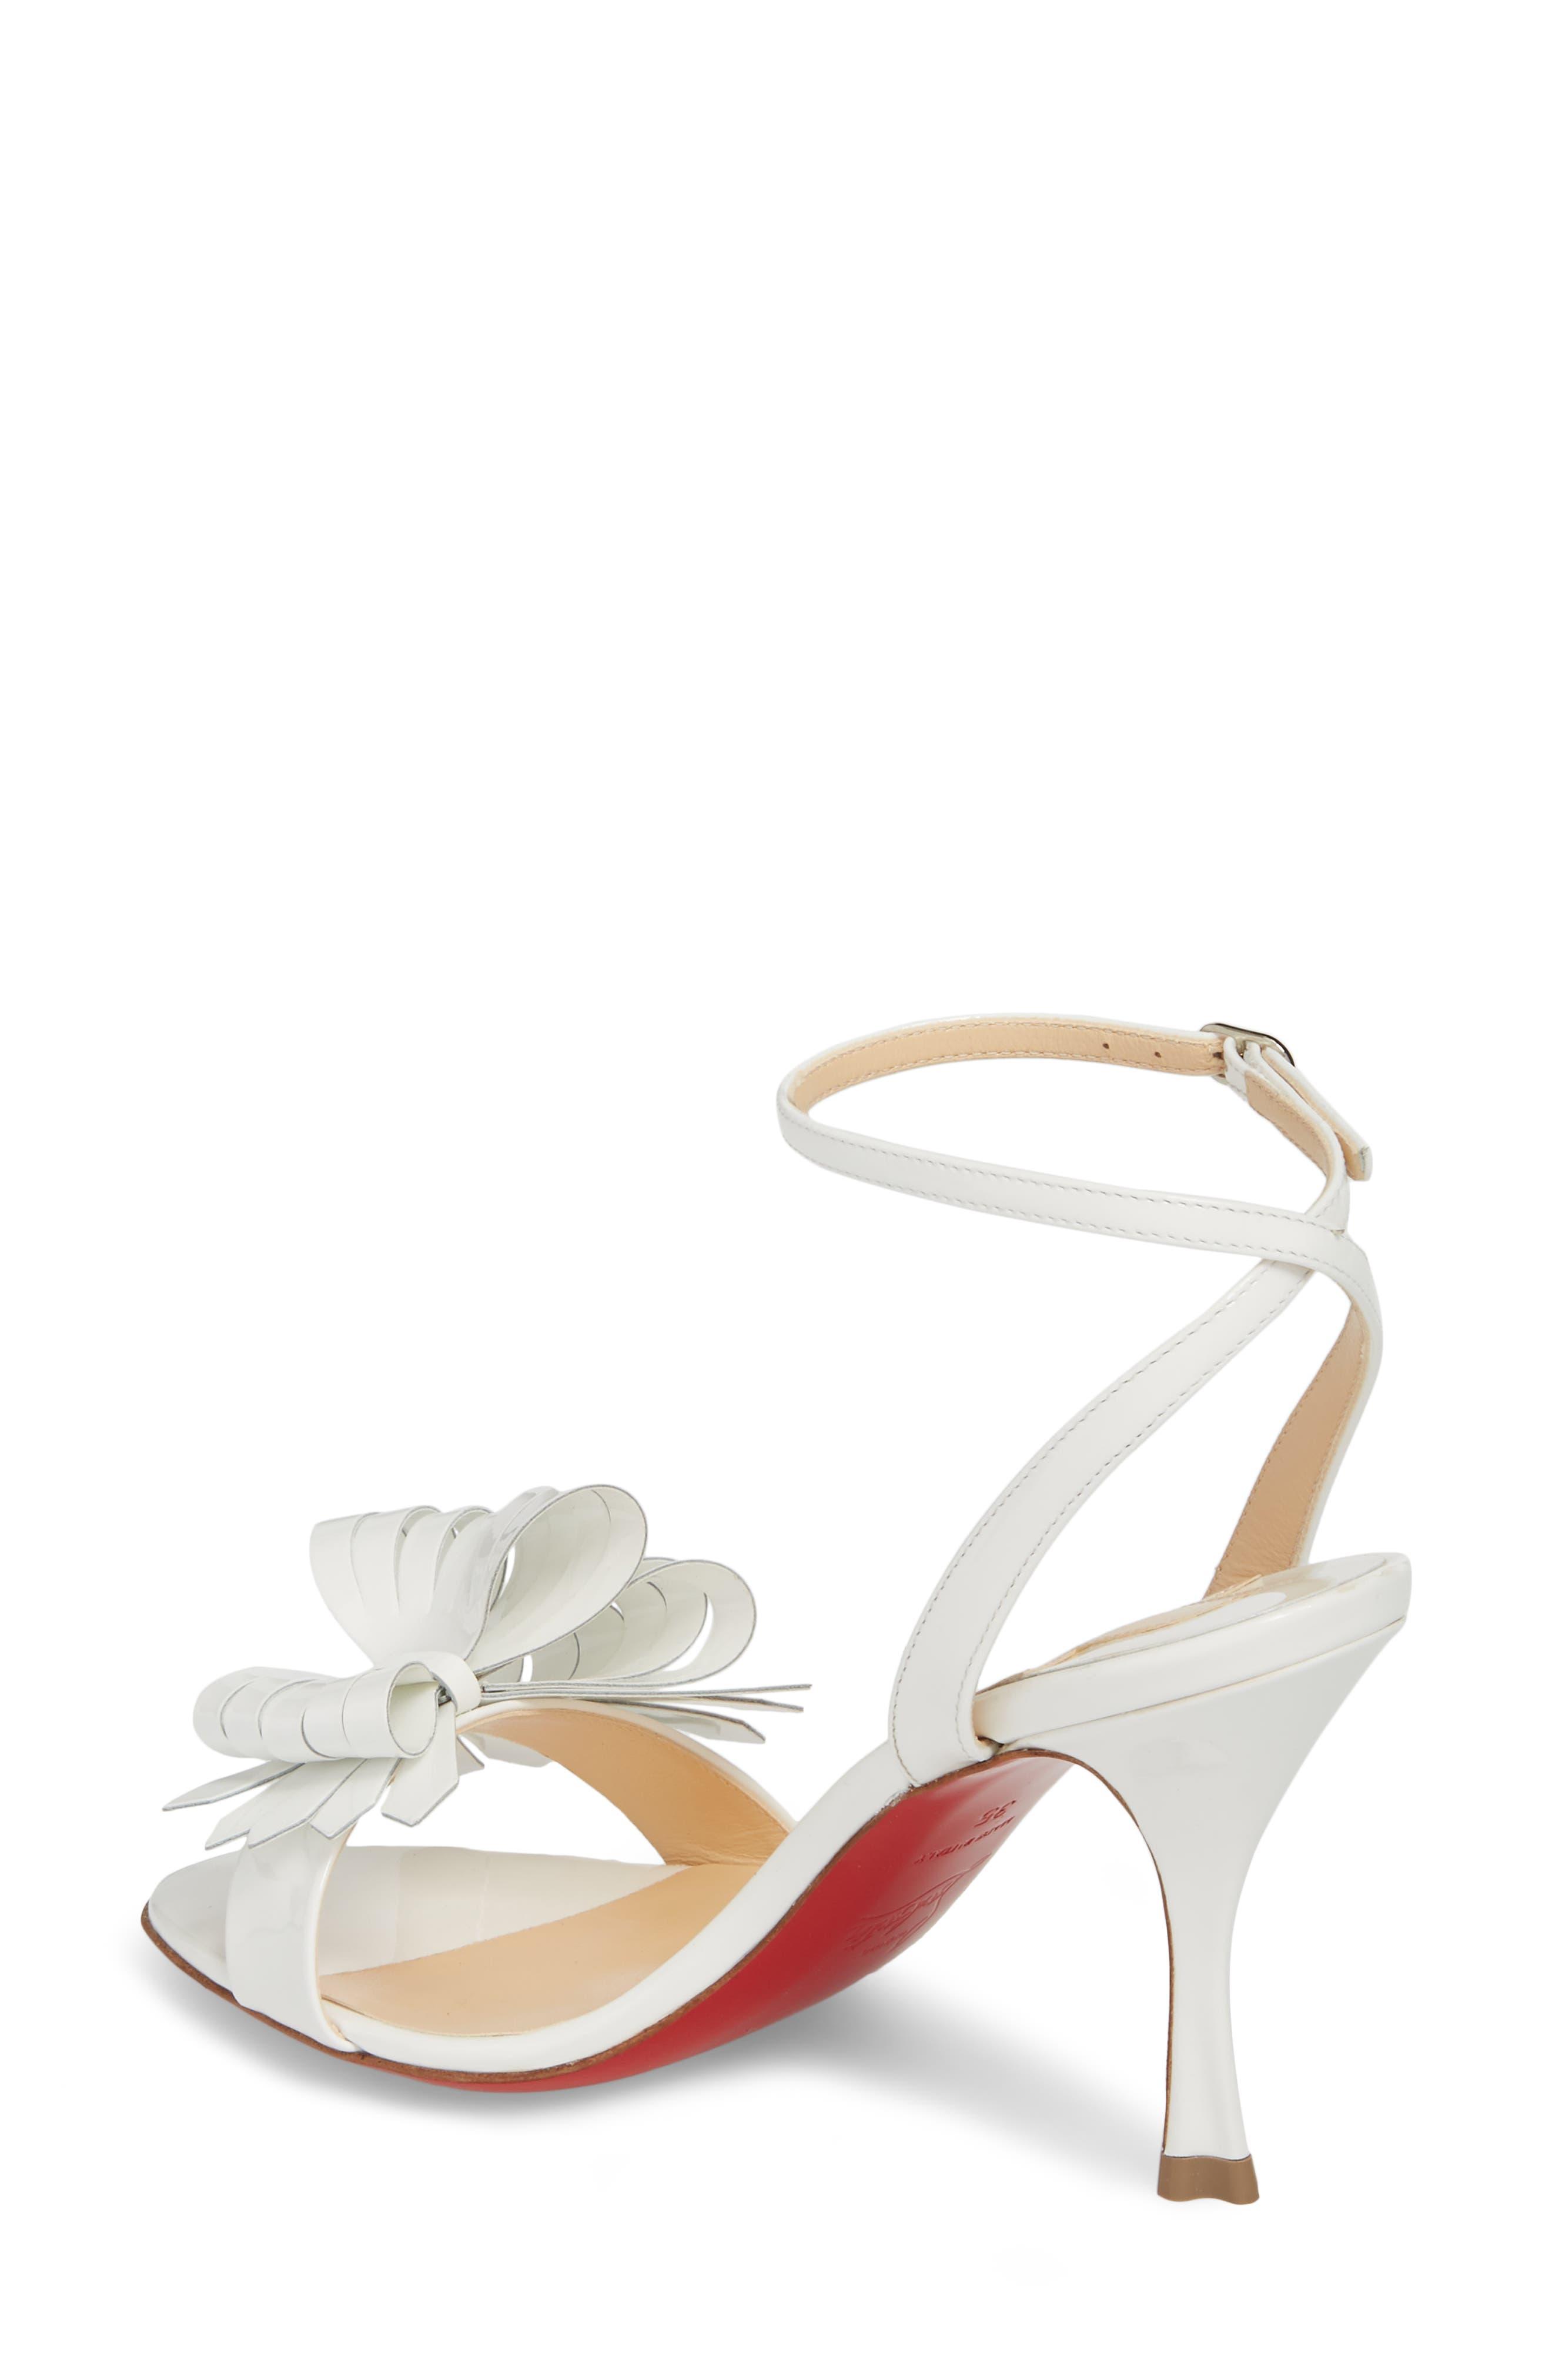 Miss Valois Bow Ankle Strap Sandal,                             Alternate thumbnail 4, color,